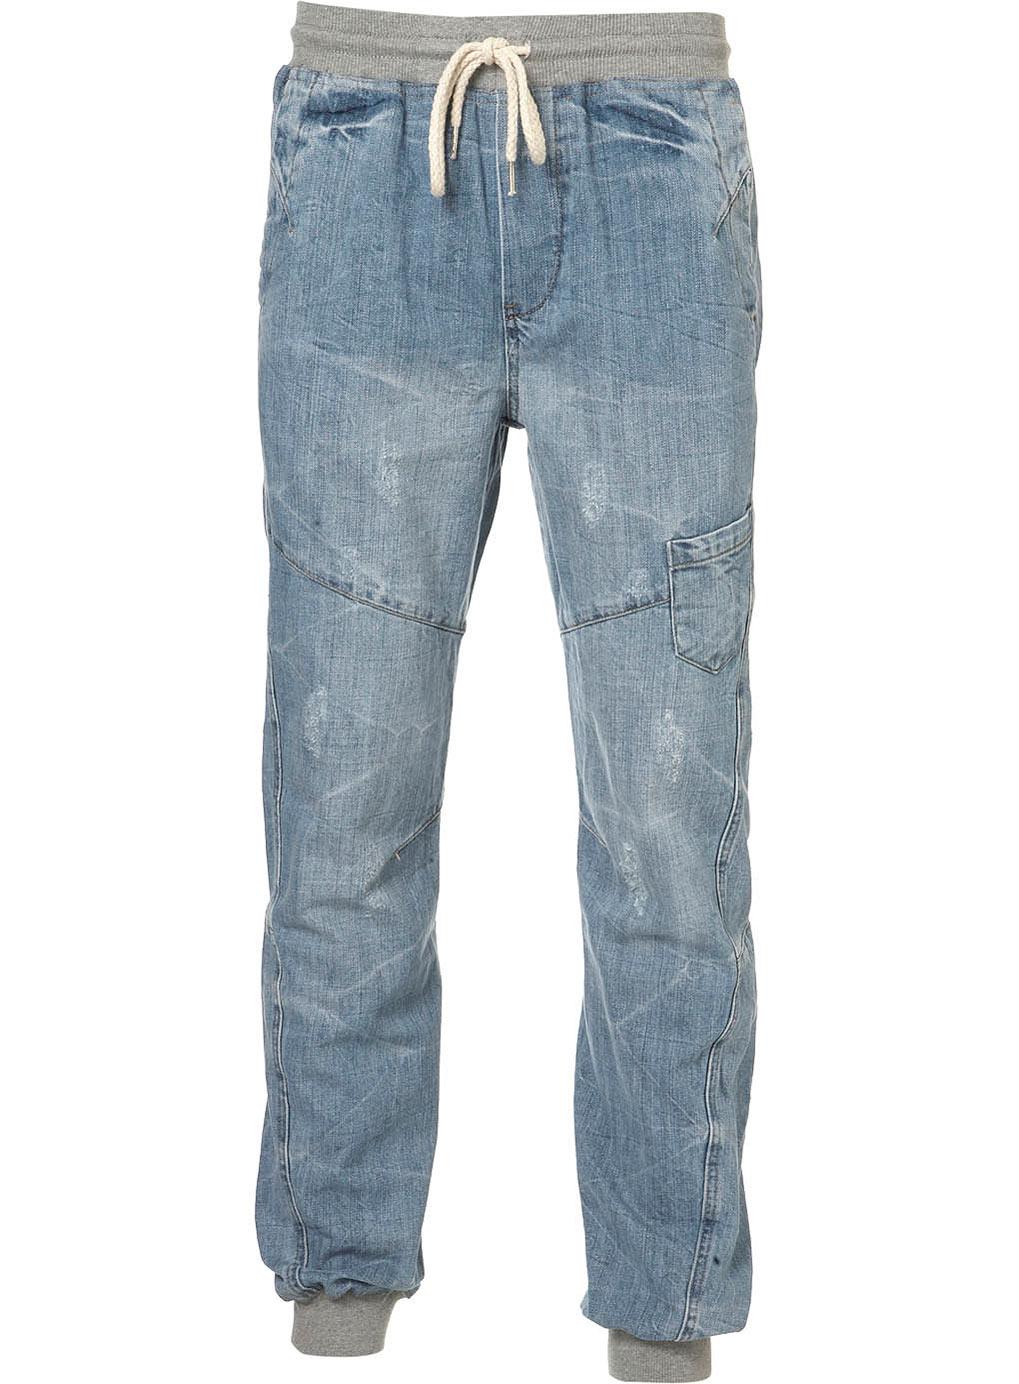 Unique Buy K DENIM Emma Jogger Jeans For Women - Womenu0026#39;s Blue/Multi/Green Joggers Online In India